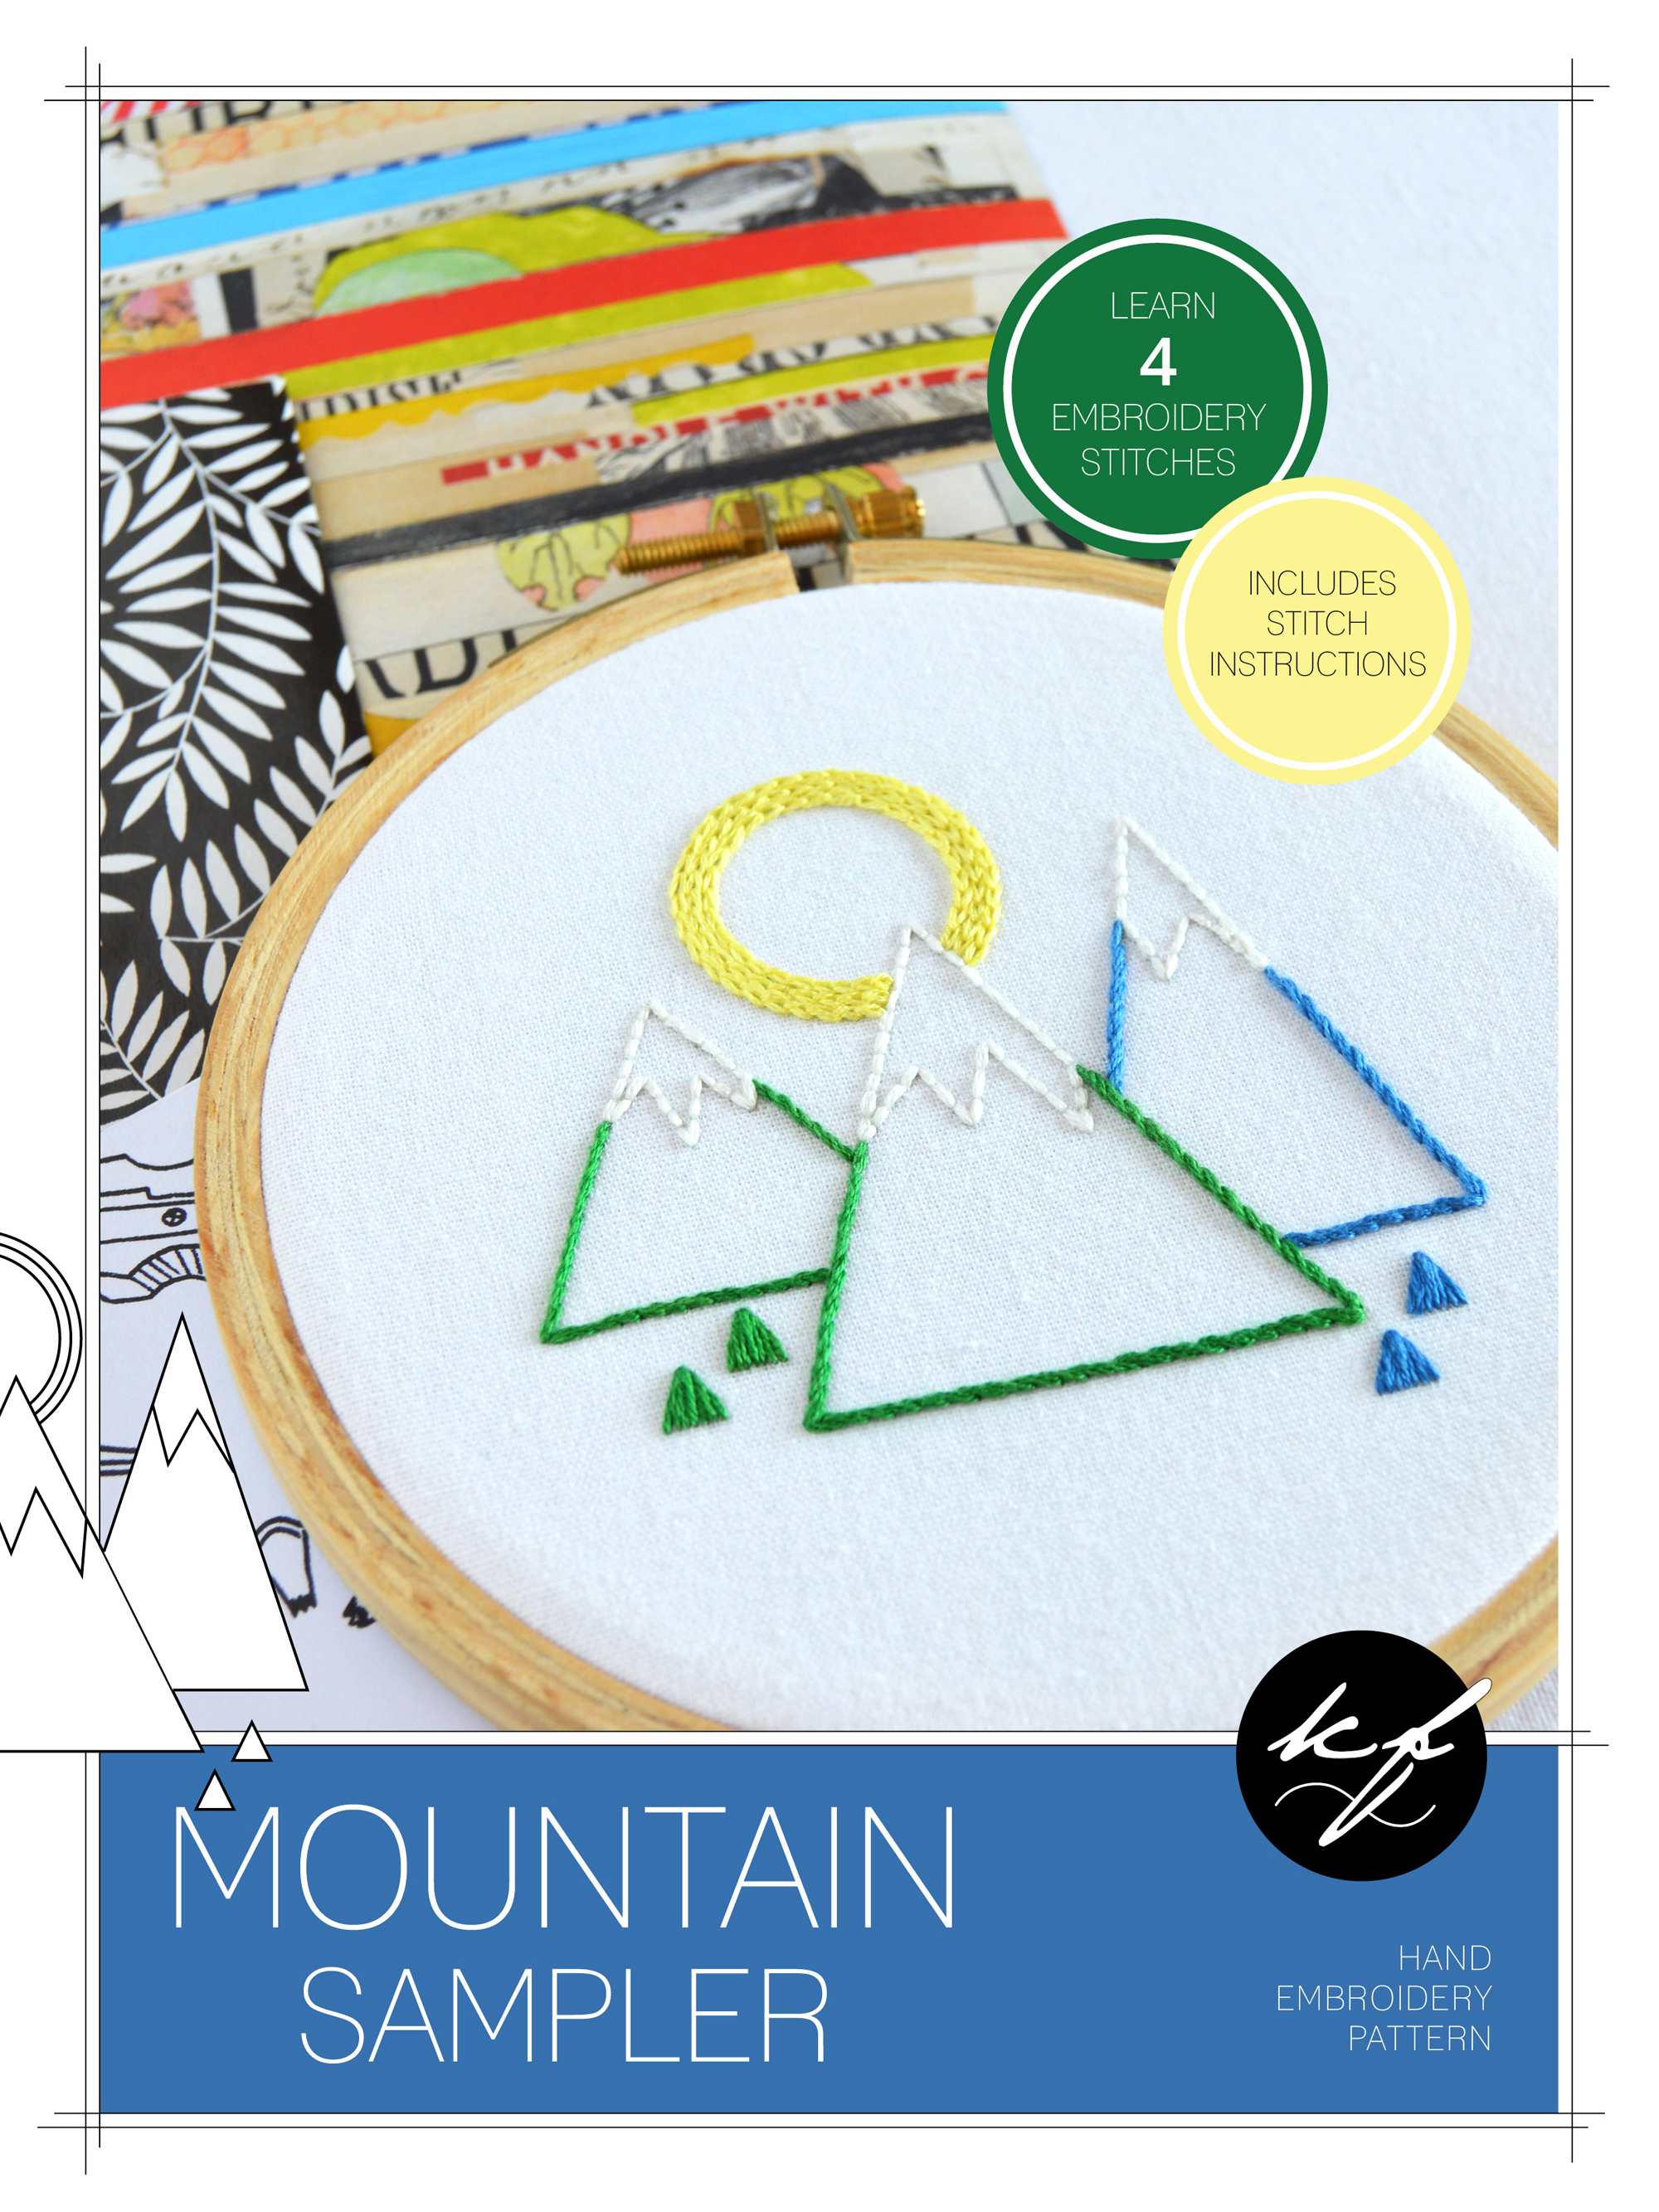 MountainSamplerEmbroideryPattern_KellyFletcher.jpg